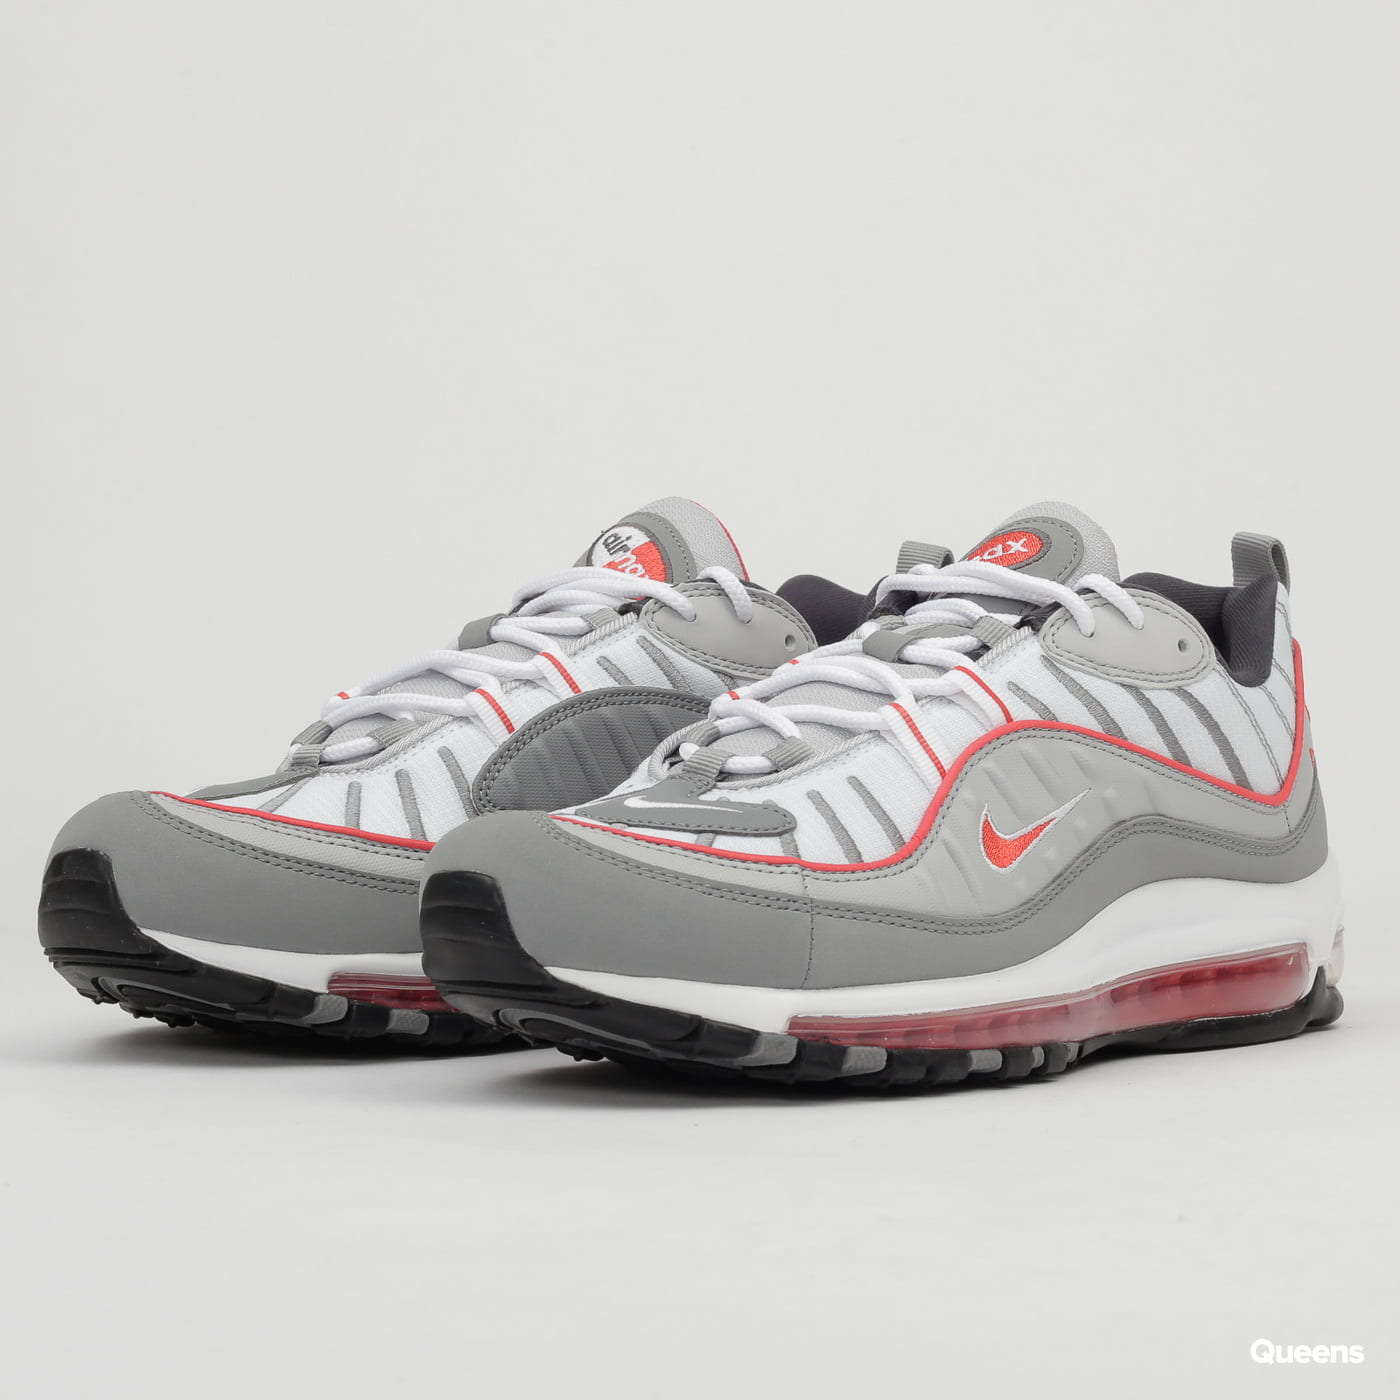 Sneakers Nike Air Max 98 particle grey